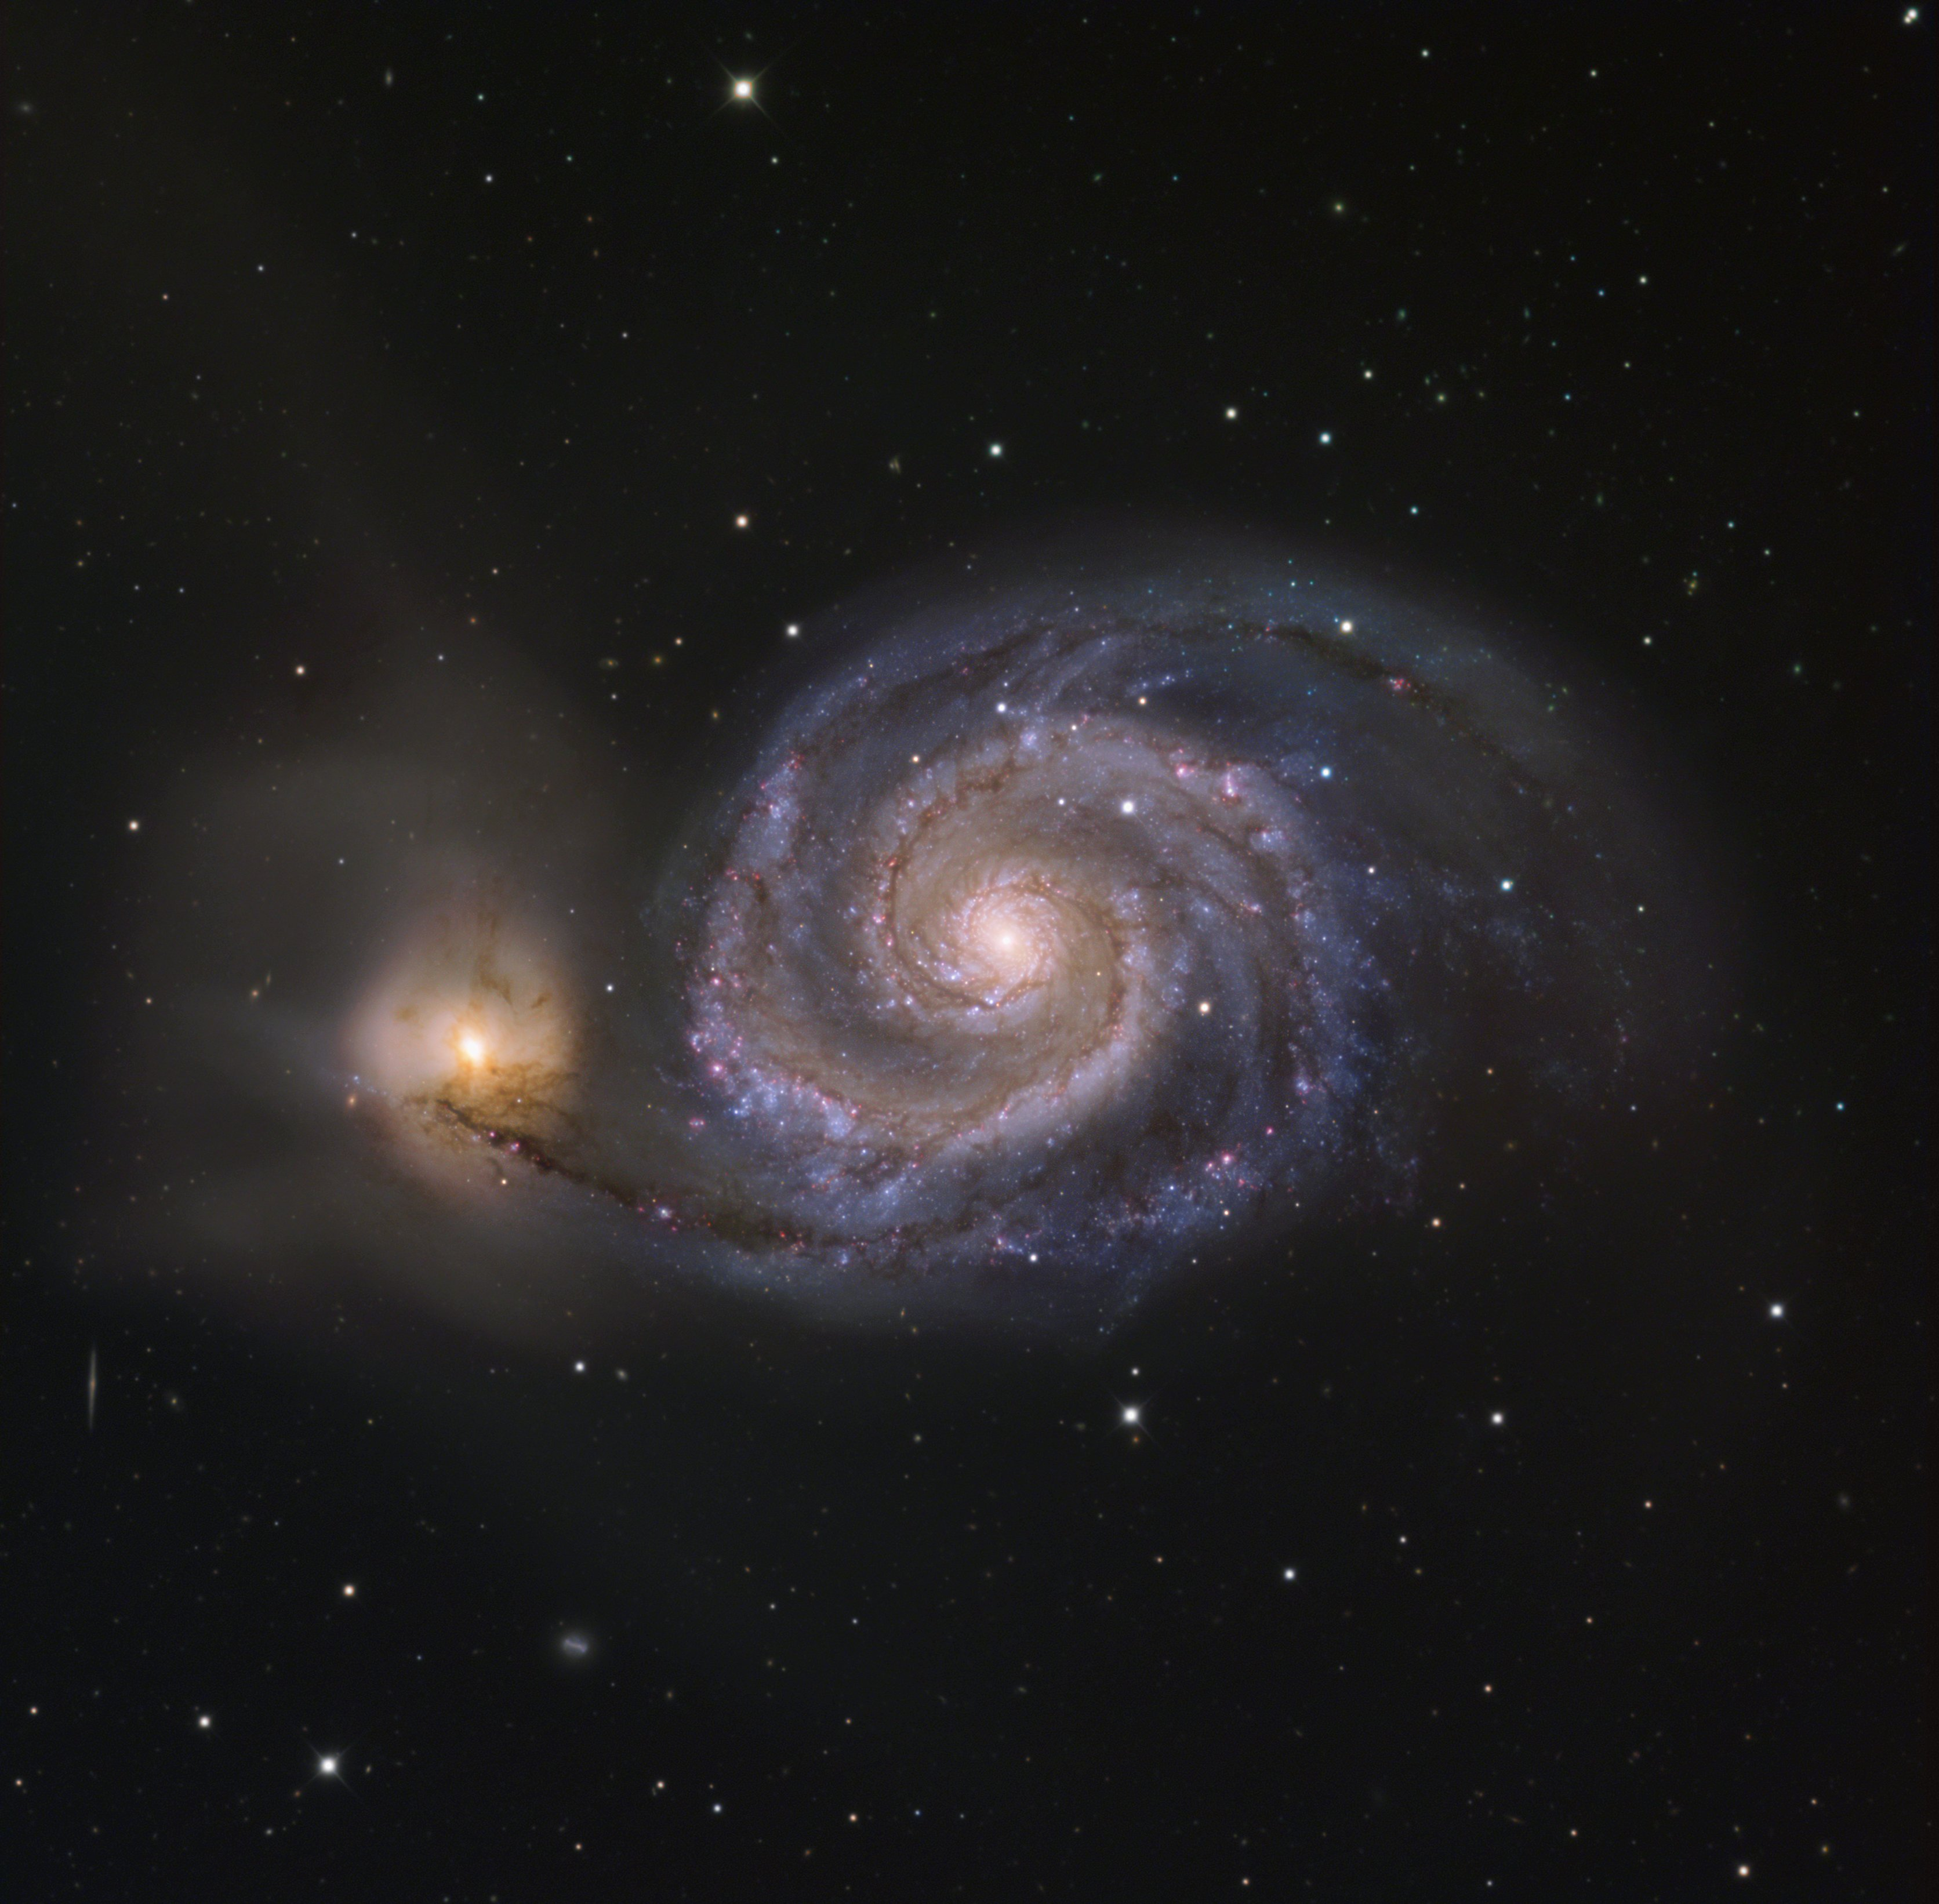 M51couleur_C2PU.JPG